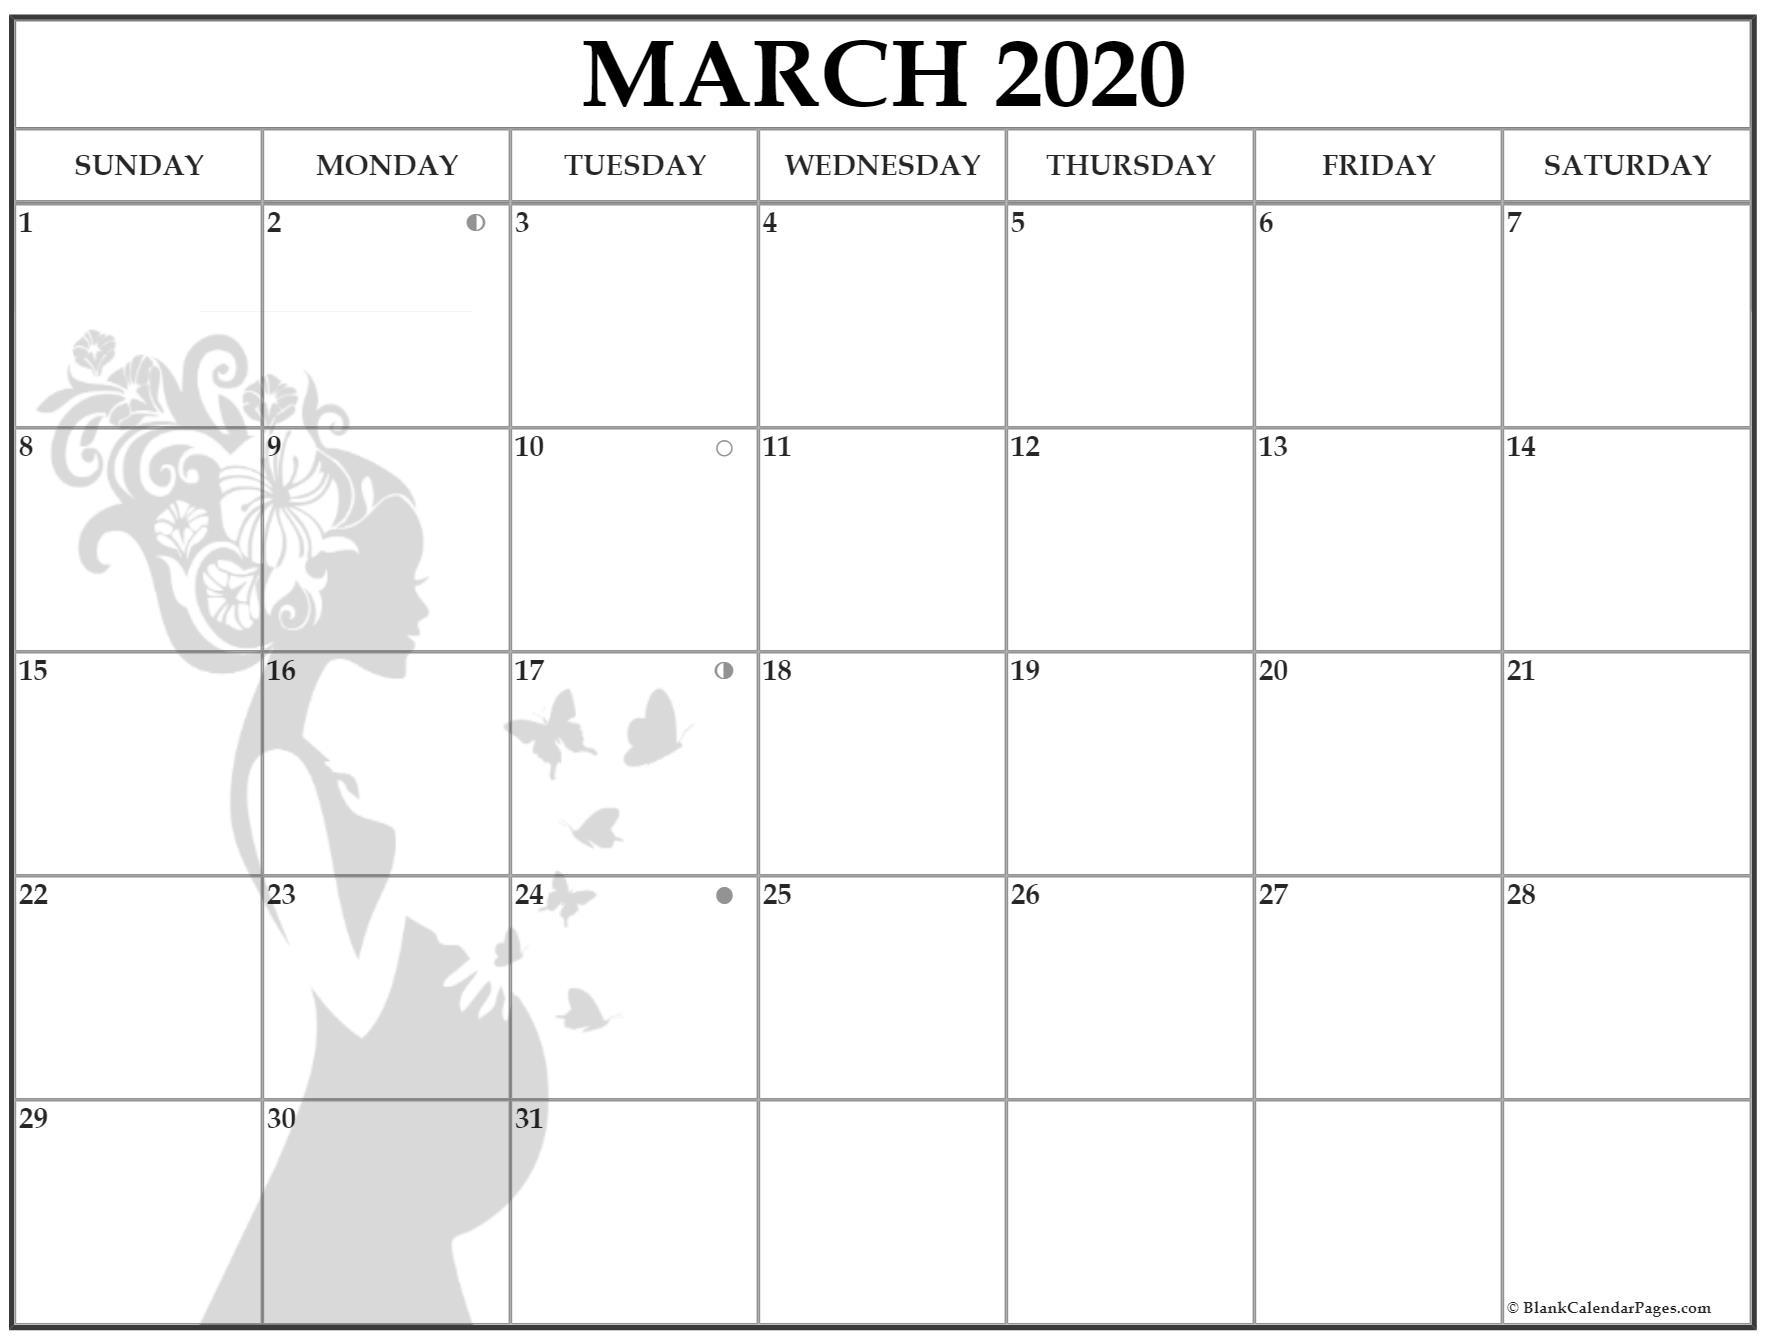 March 2020 Pregnancy Calendar   Fertility Calendar March 2020 Lunar Calendar